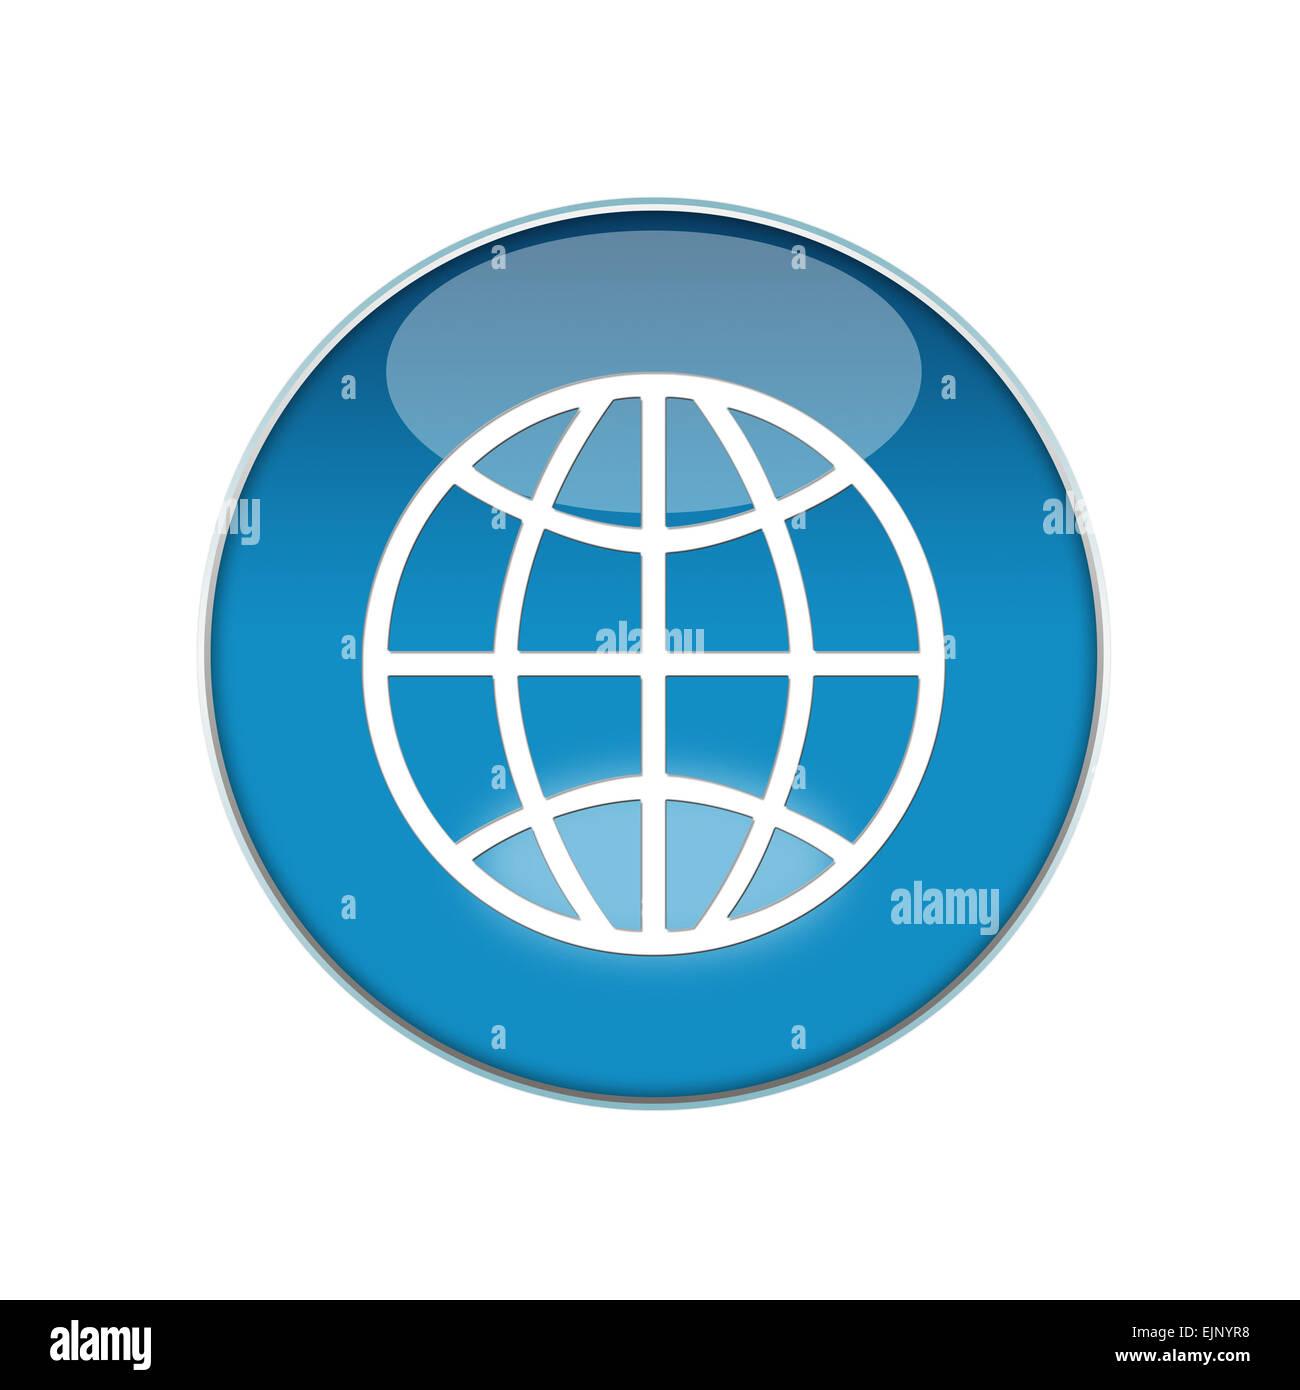 button blue world white reflection sign logo circle push